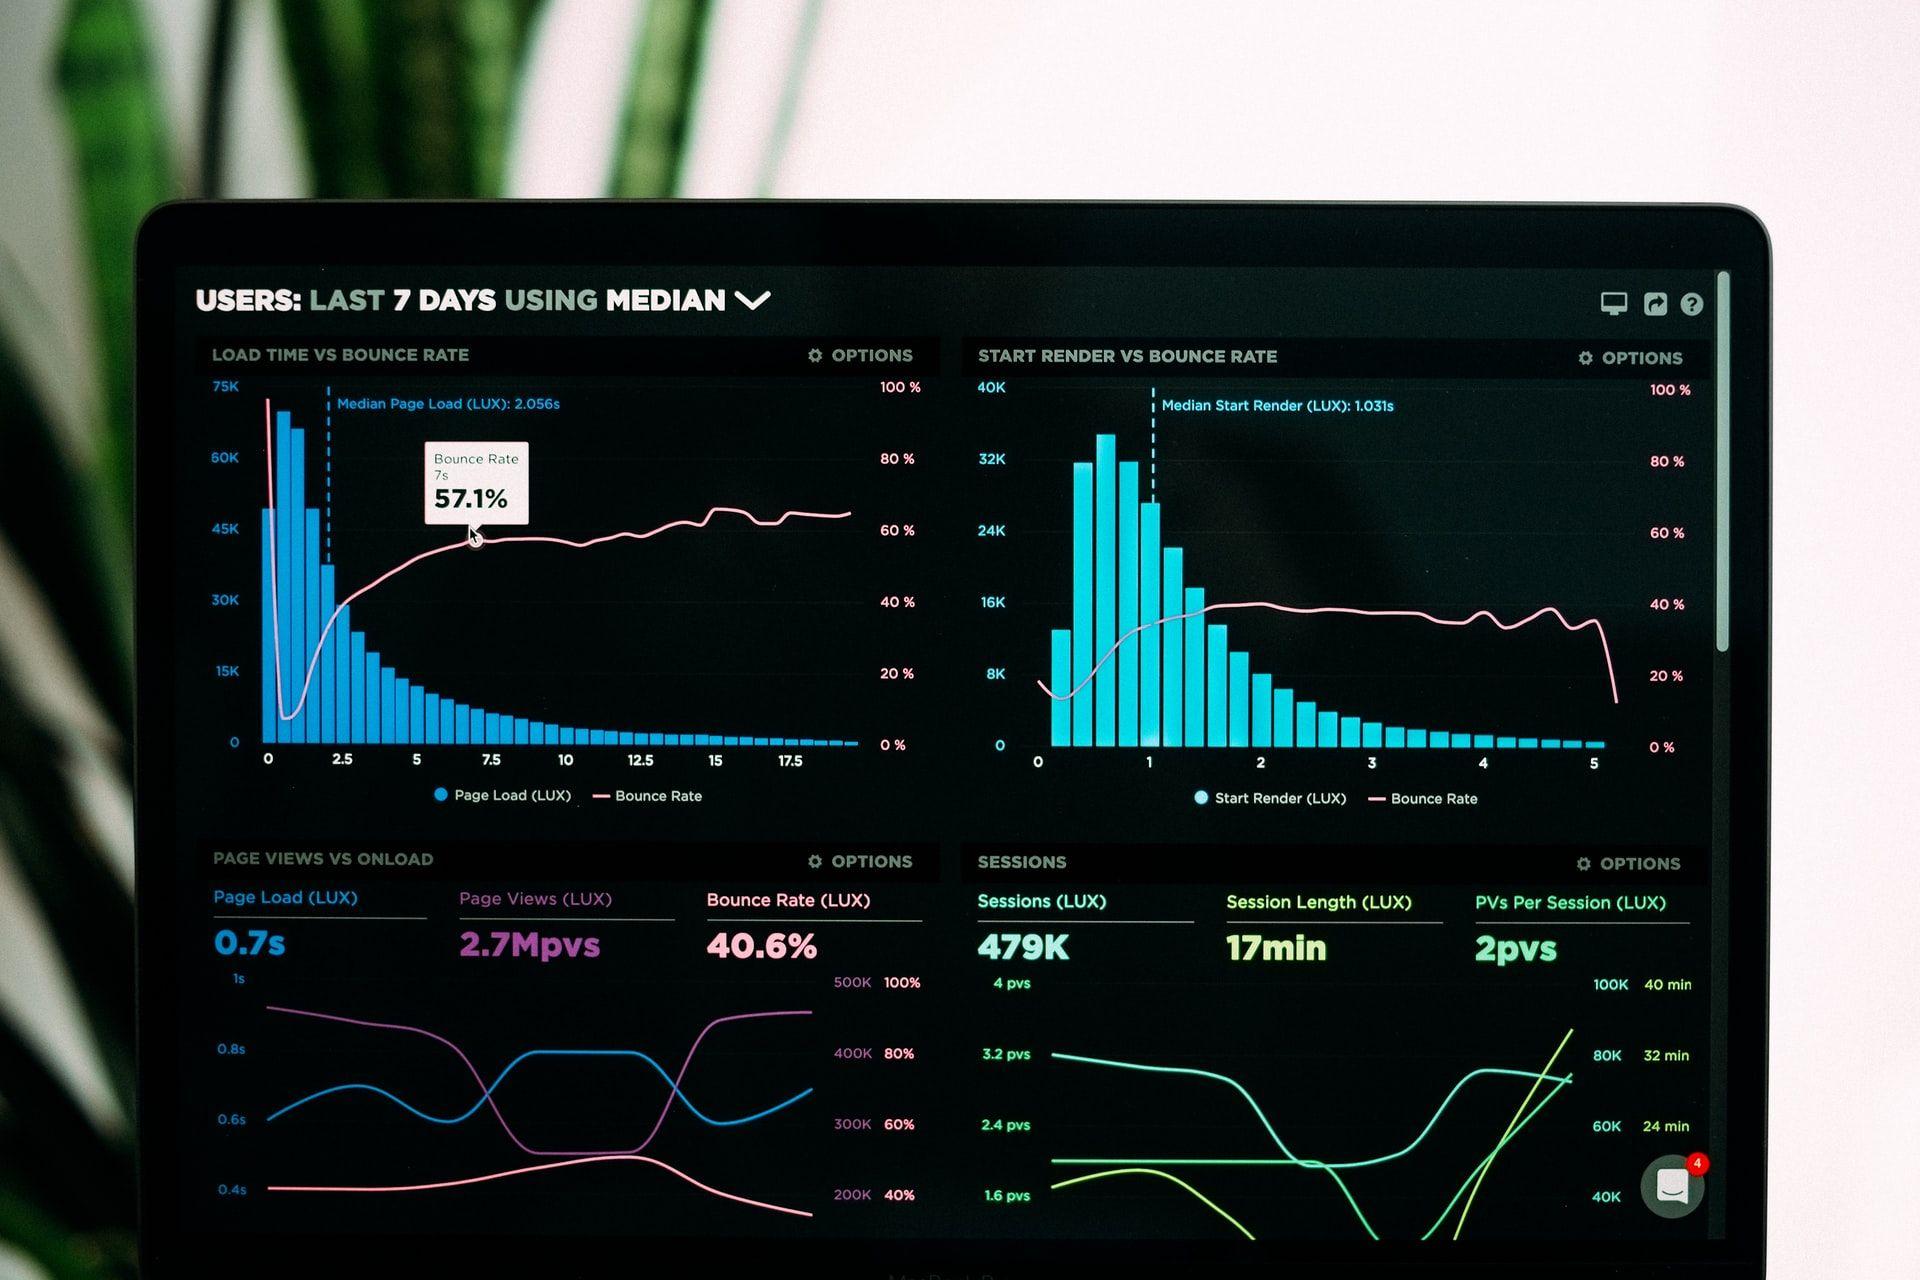 mlearning analytics graphs